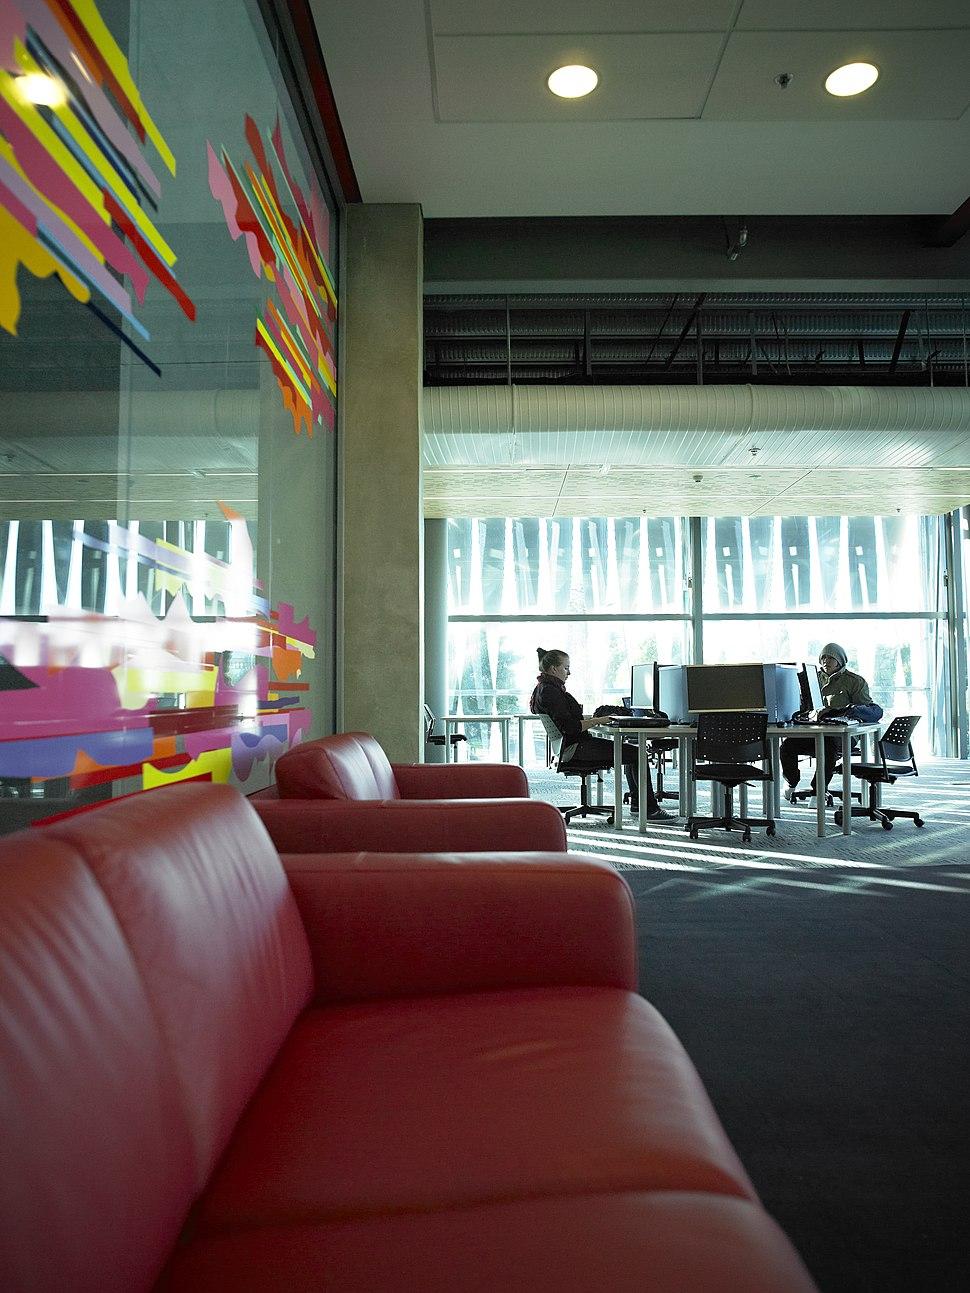 Computer lab inside the University of Waikato Student Centre